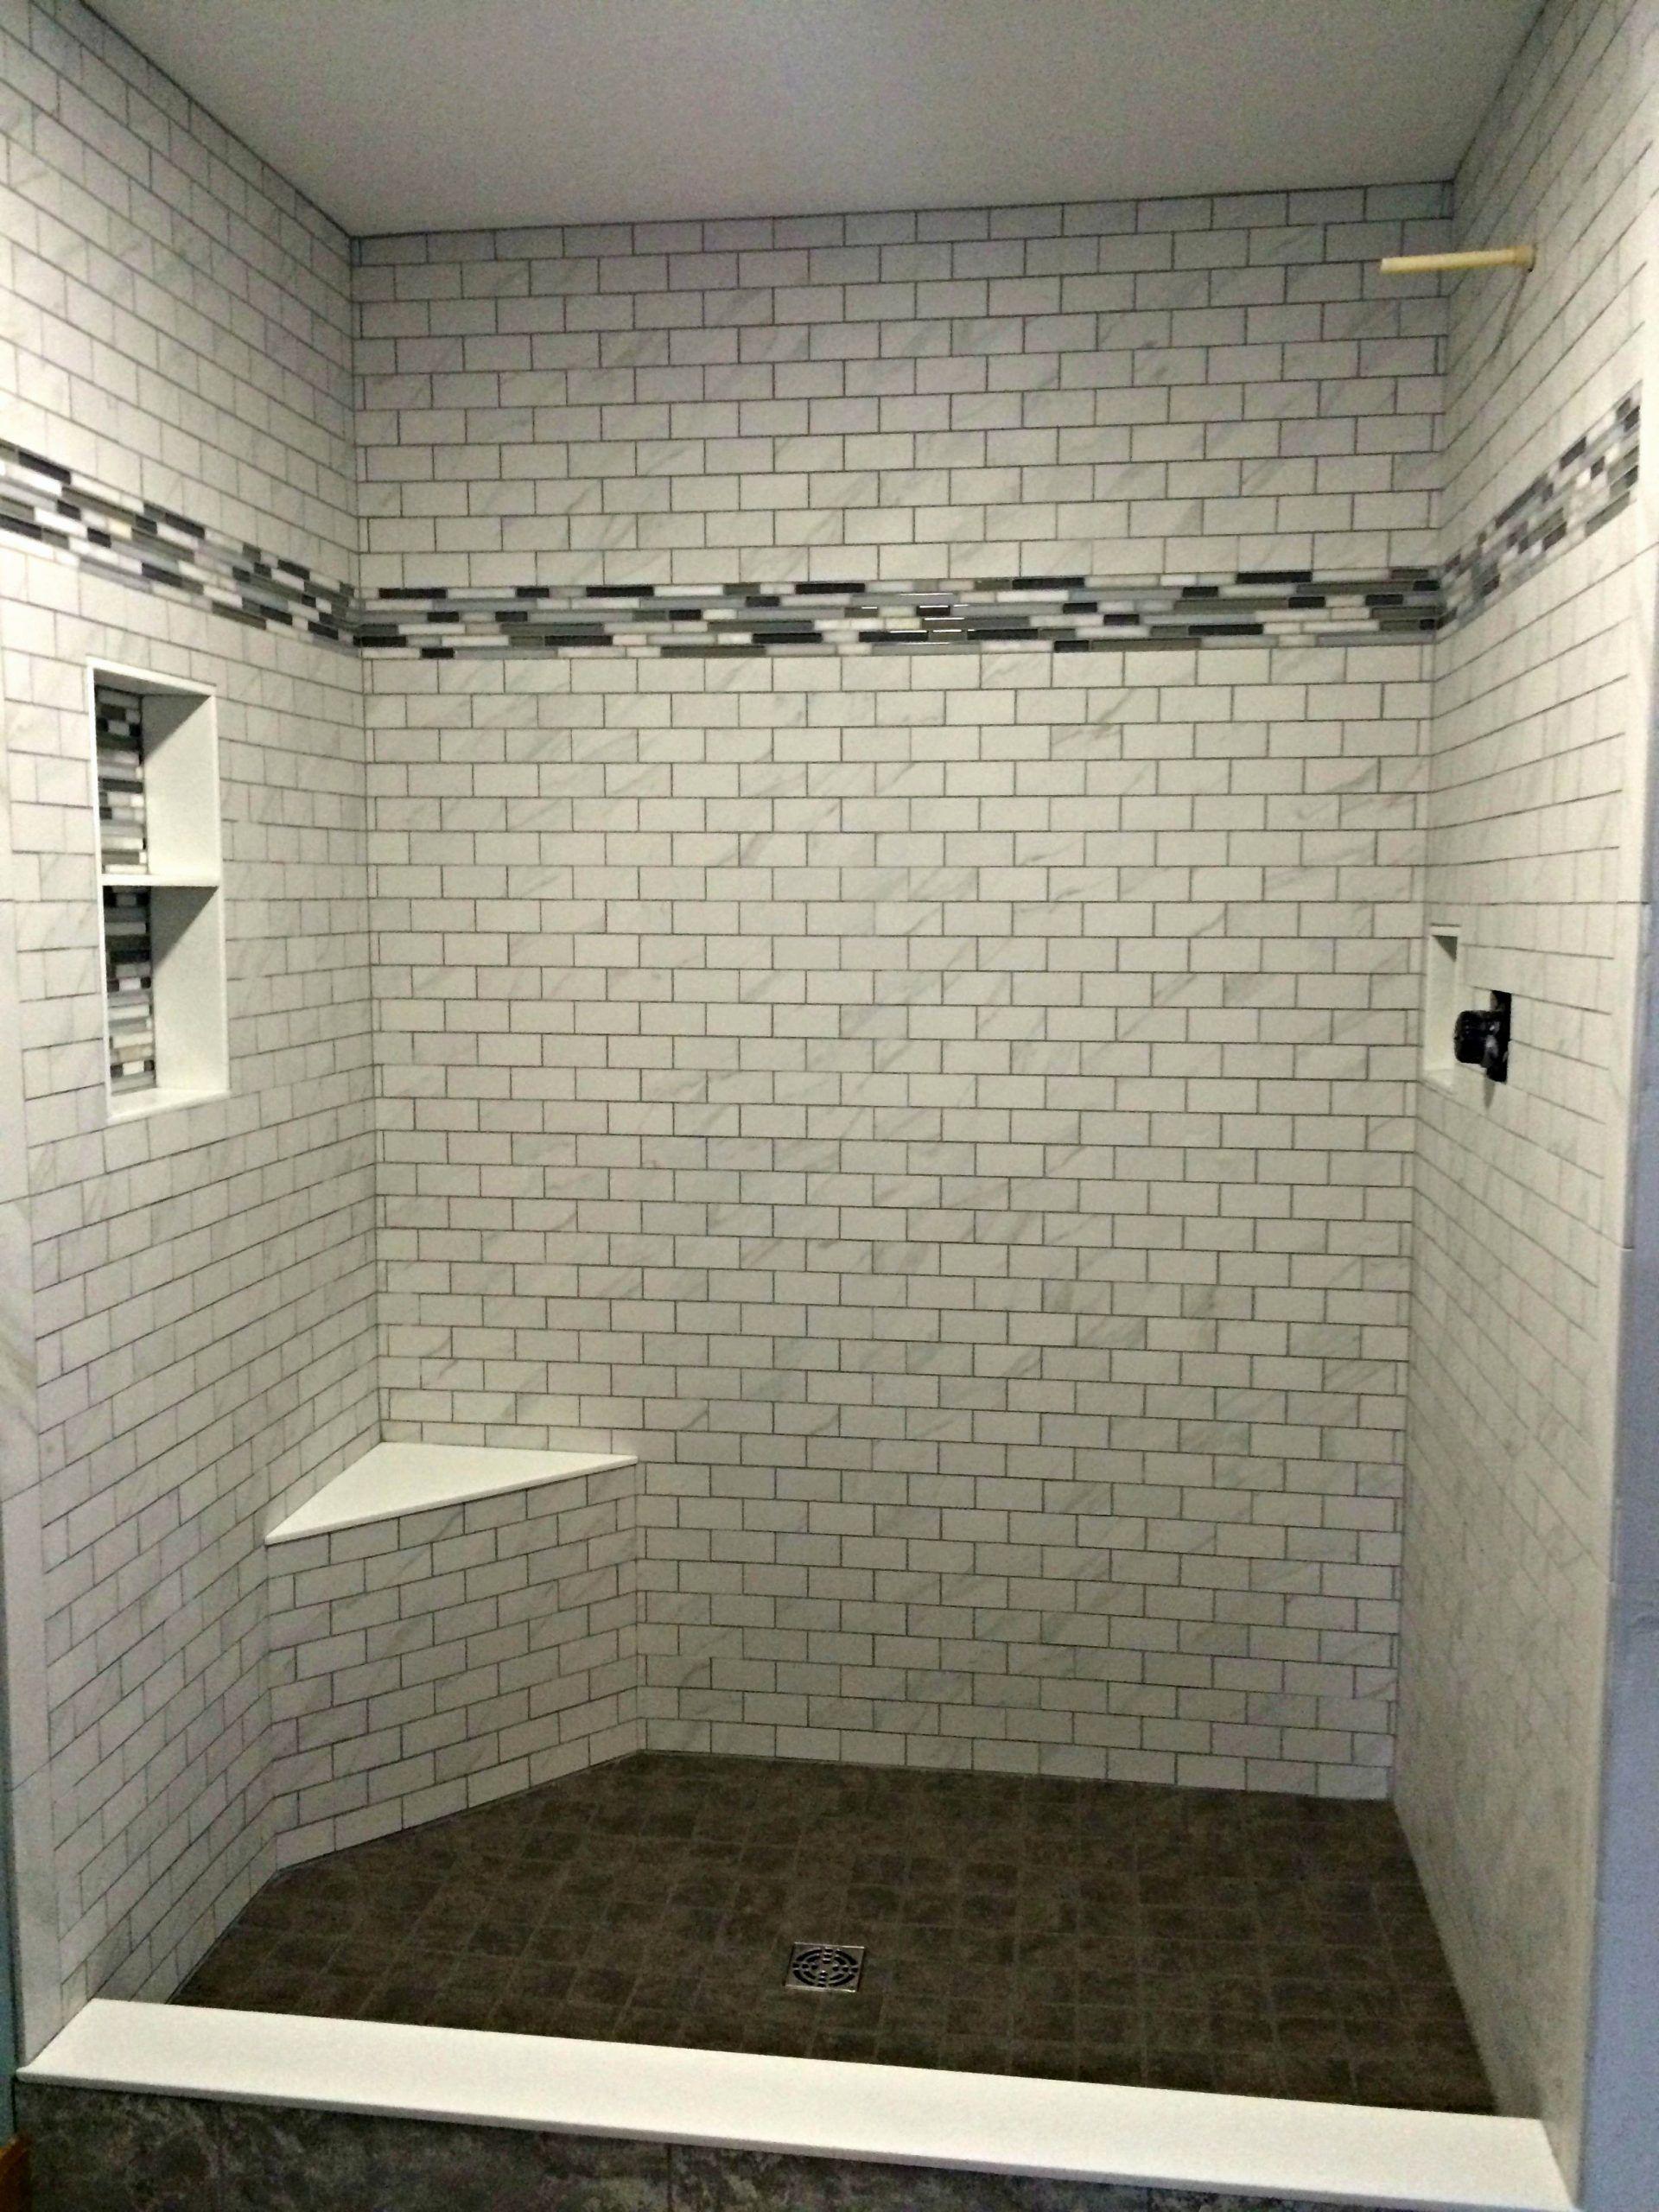 Bathroom Tile Prices Per Square Foot New Mosaic Tile Florentine 2 X4 Carrara In 2020 Tile Bathroom Shower Wall Tile Shower Tile